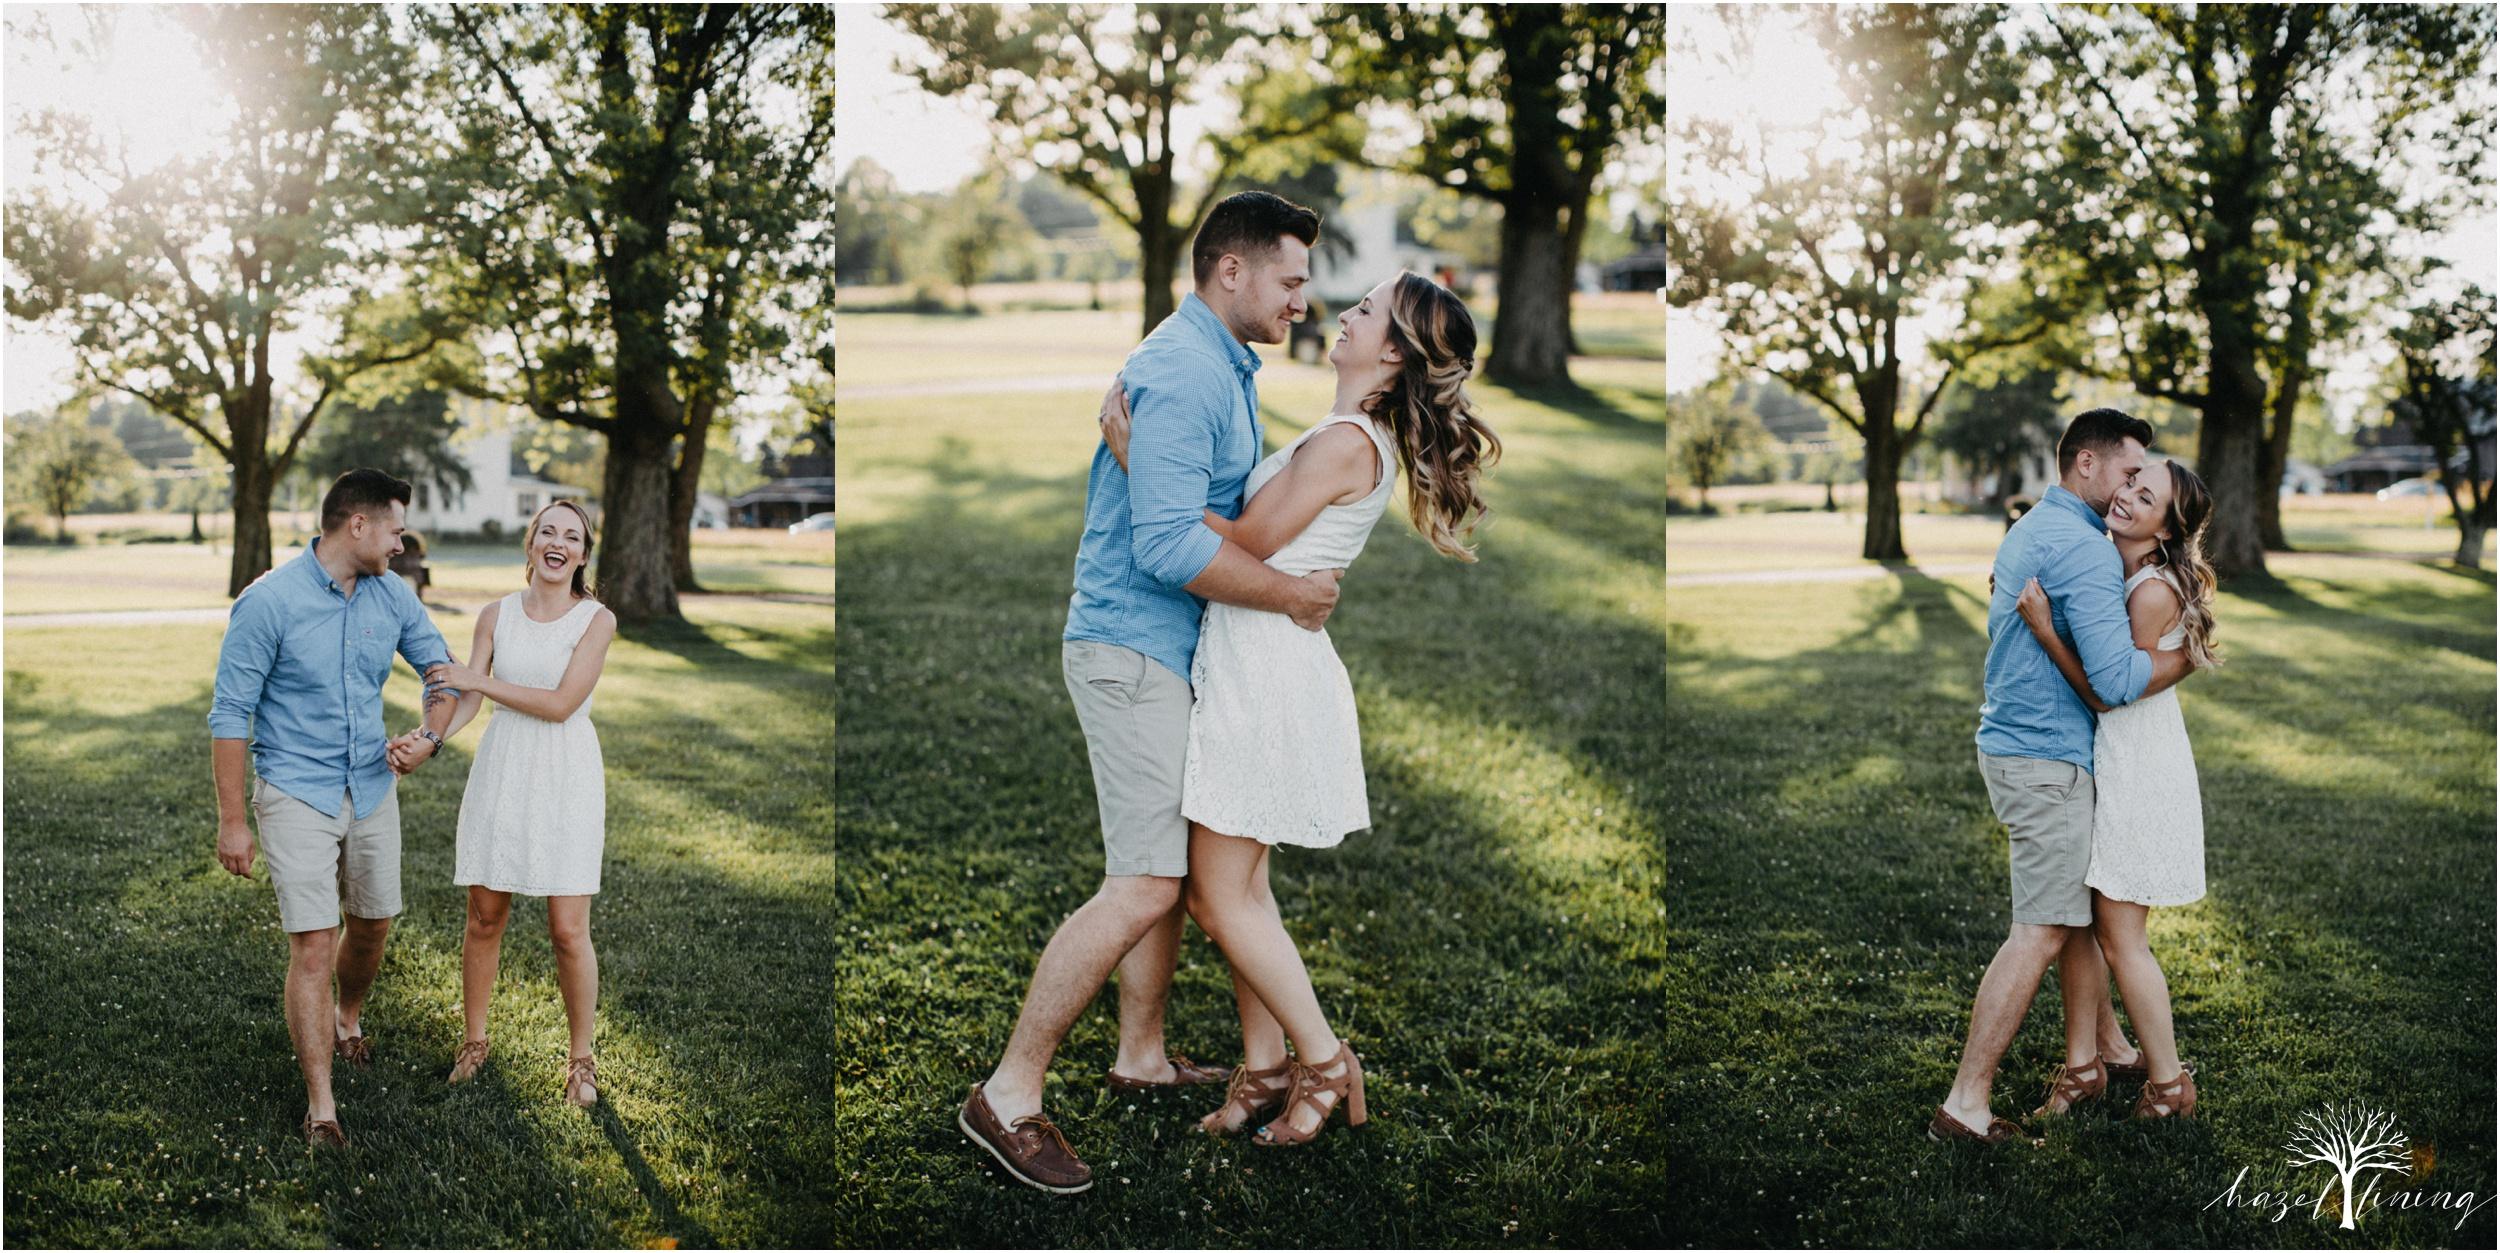 rachel-warner-chris-niedrist-the-farm-bakery-and-events-quakertown-pa-summer-engagement-hazel-lining-photography-destination-elopement-wedding-engagement-photography_0003.jpg